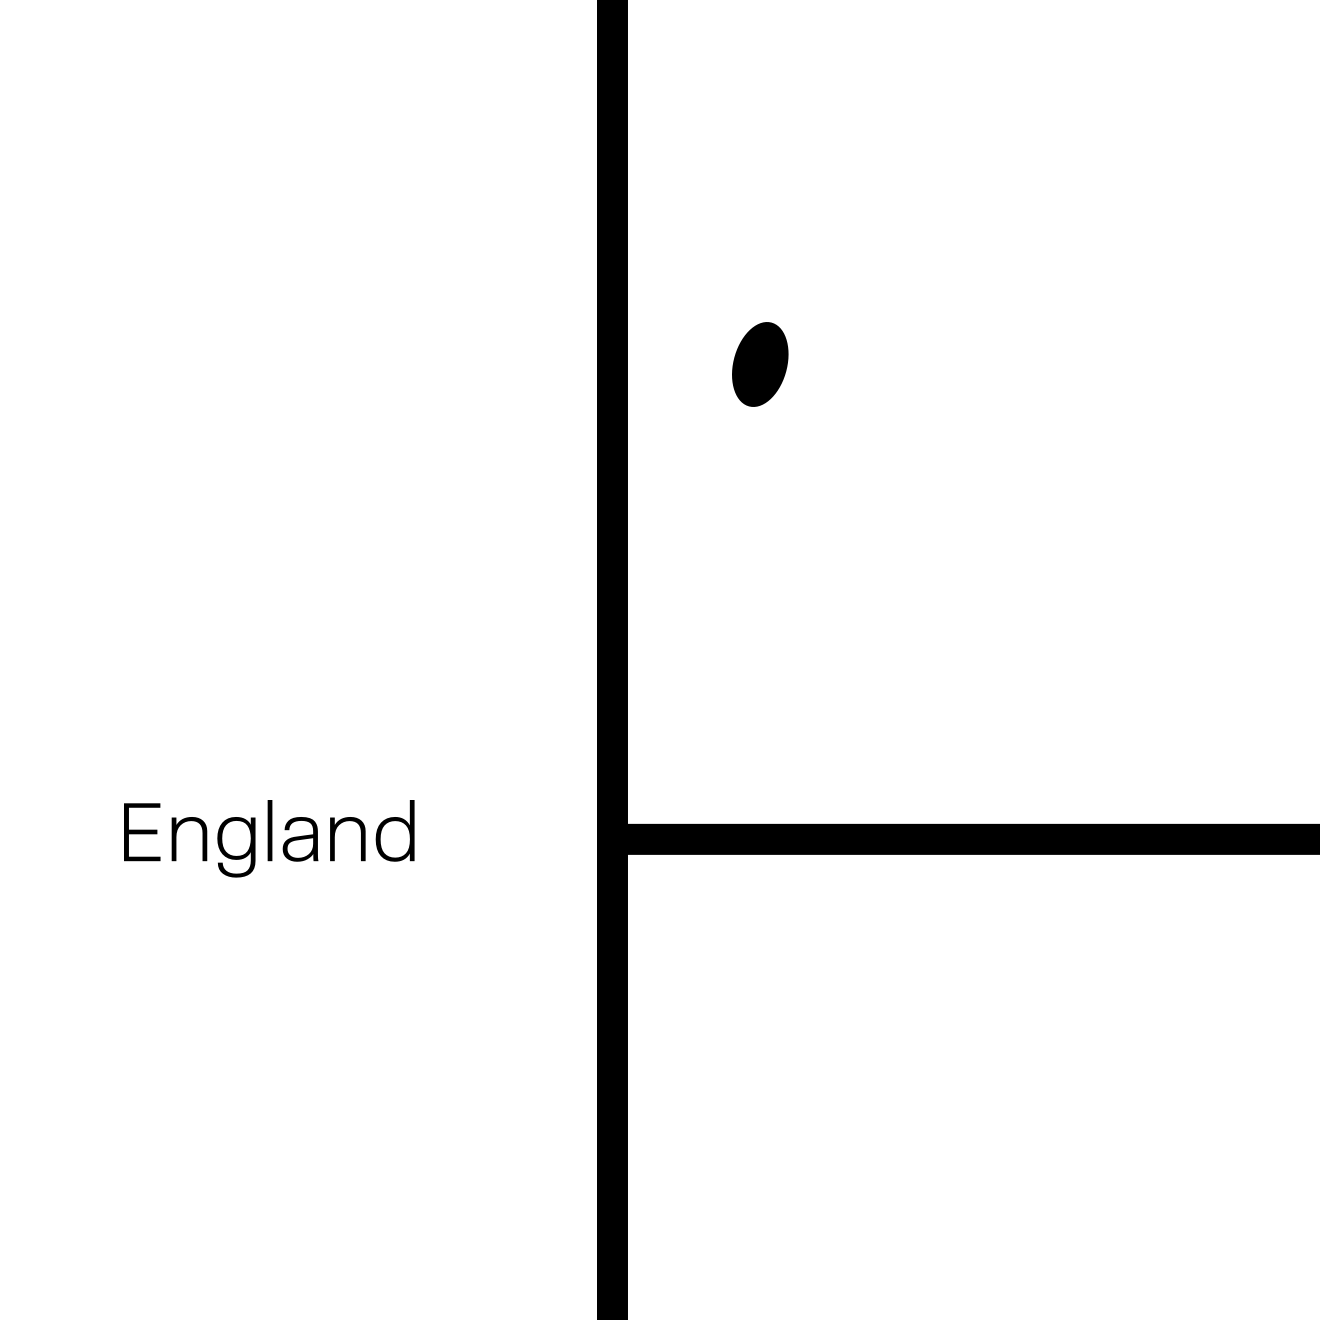 logo-england-rugby